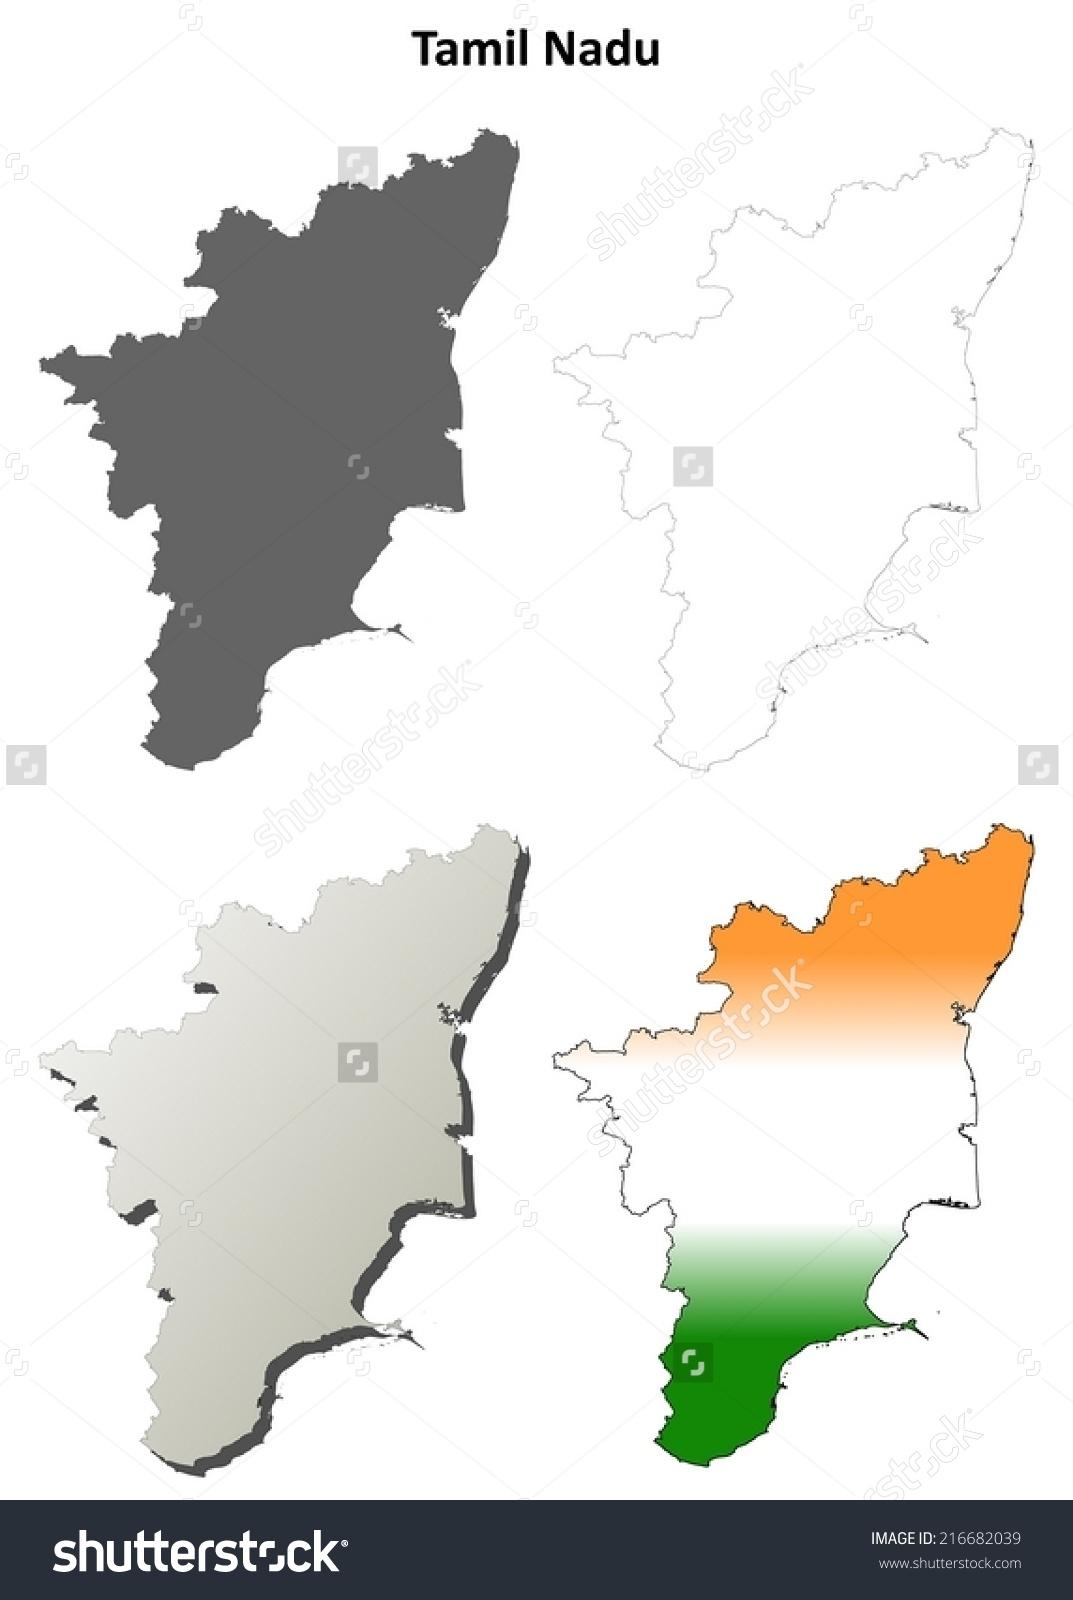 Tamil Nadu Blank Detailed Outline Map Stock Vector 216682039.